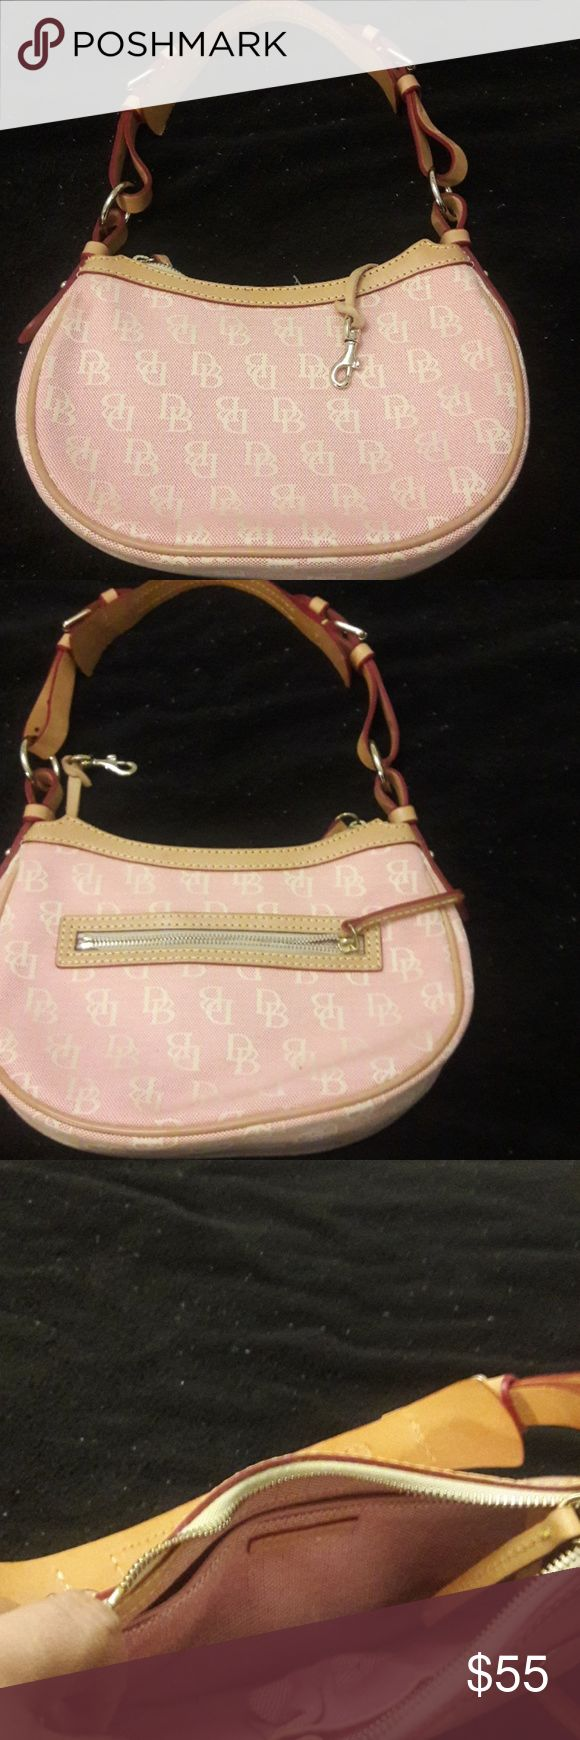 Dooney & Bourke purse Shoulder purse very cute NEW never used, no tags. Dooney & Bourke Bags Shoulder Bags